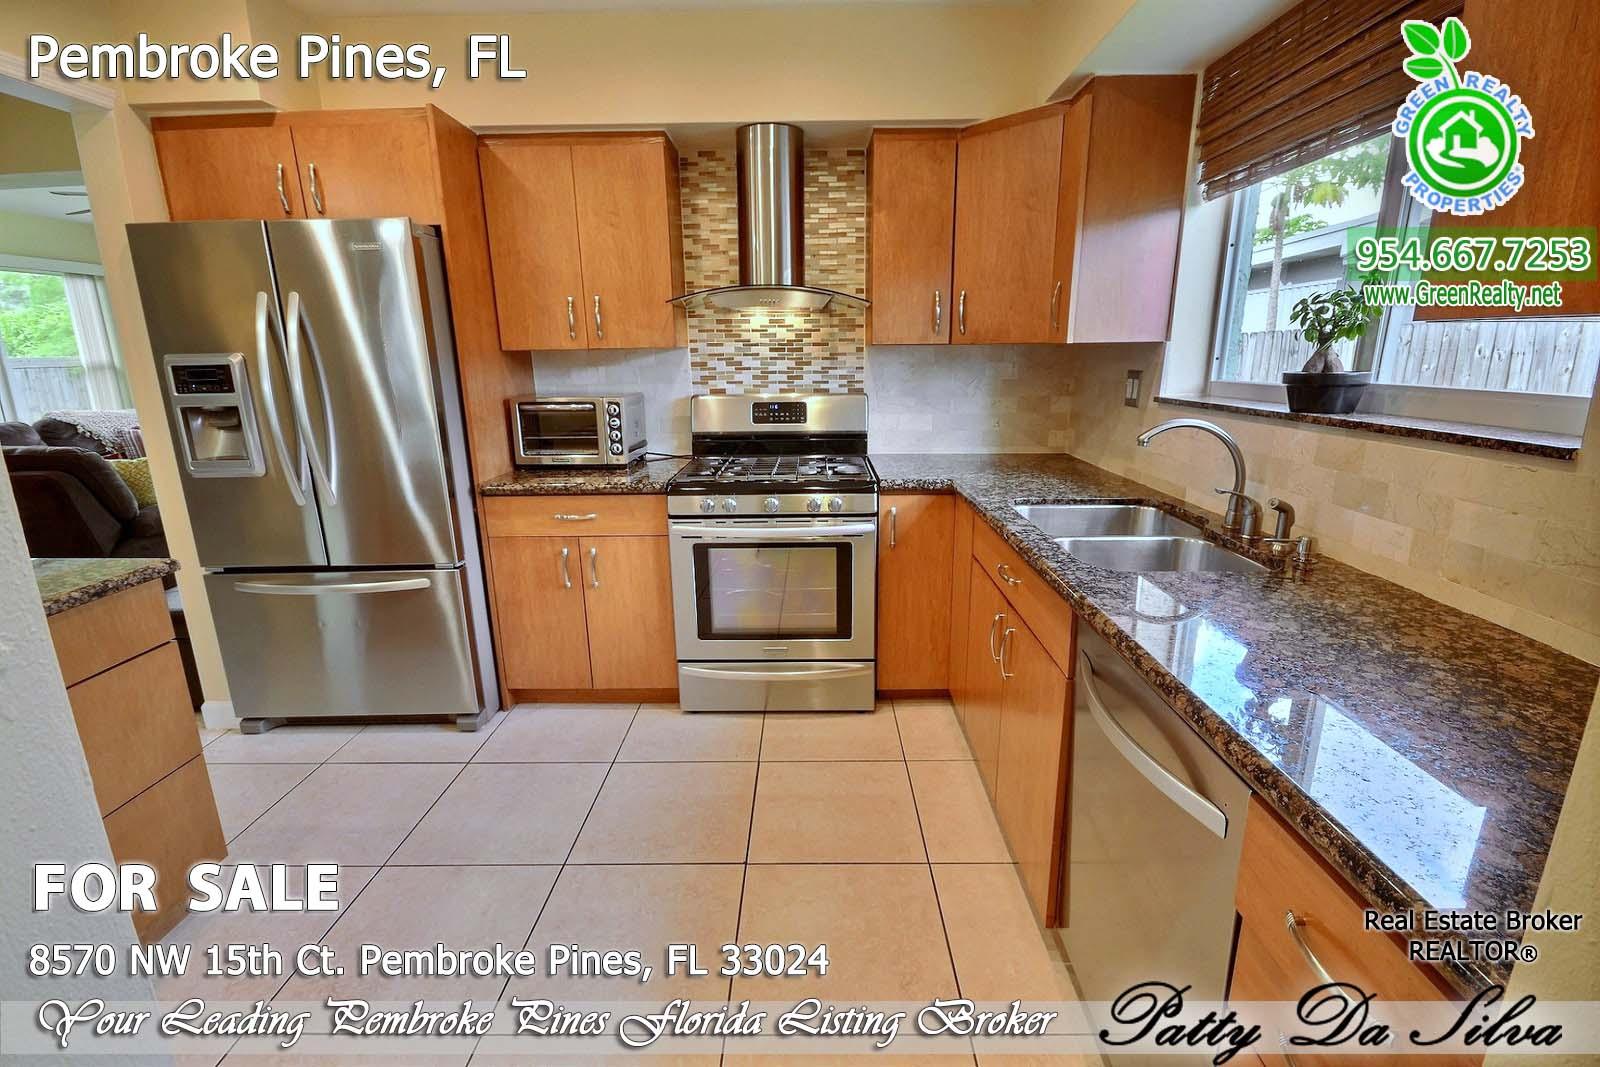 Pembroke Pines Homes For Sale - Best REALTORS (15)